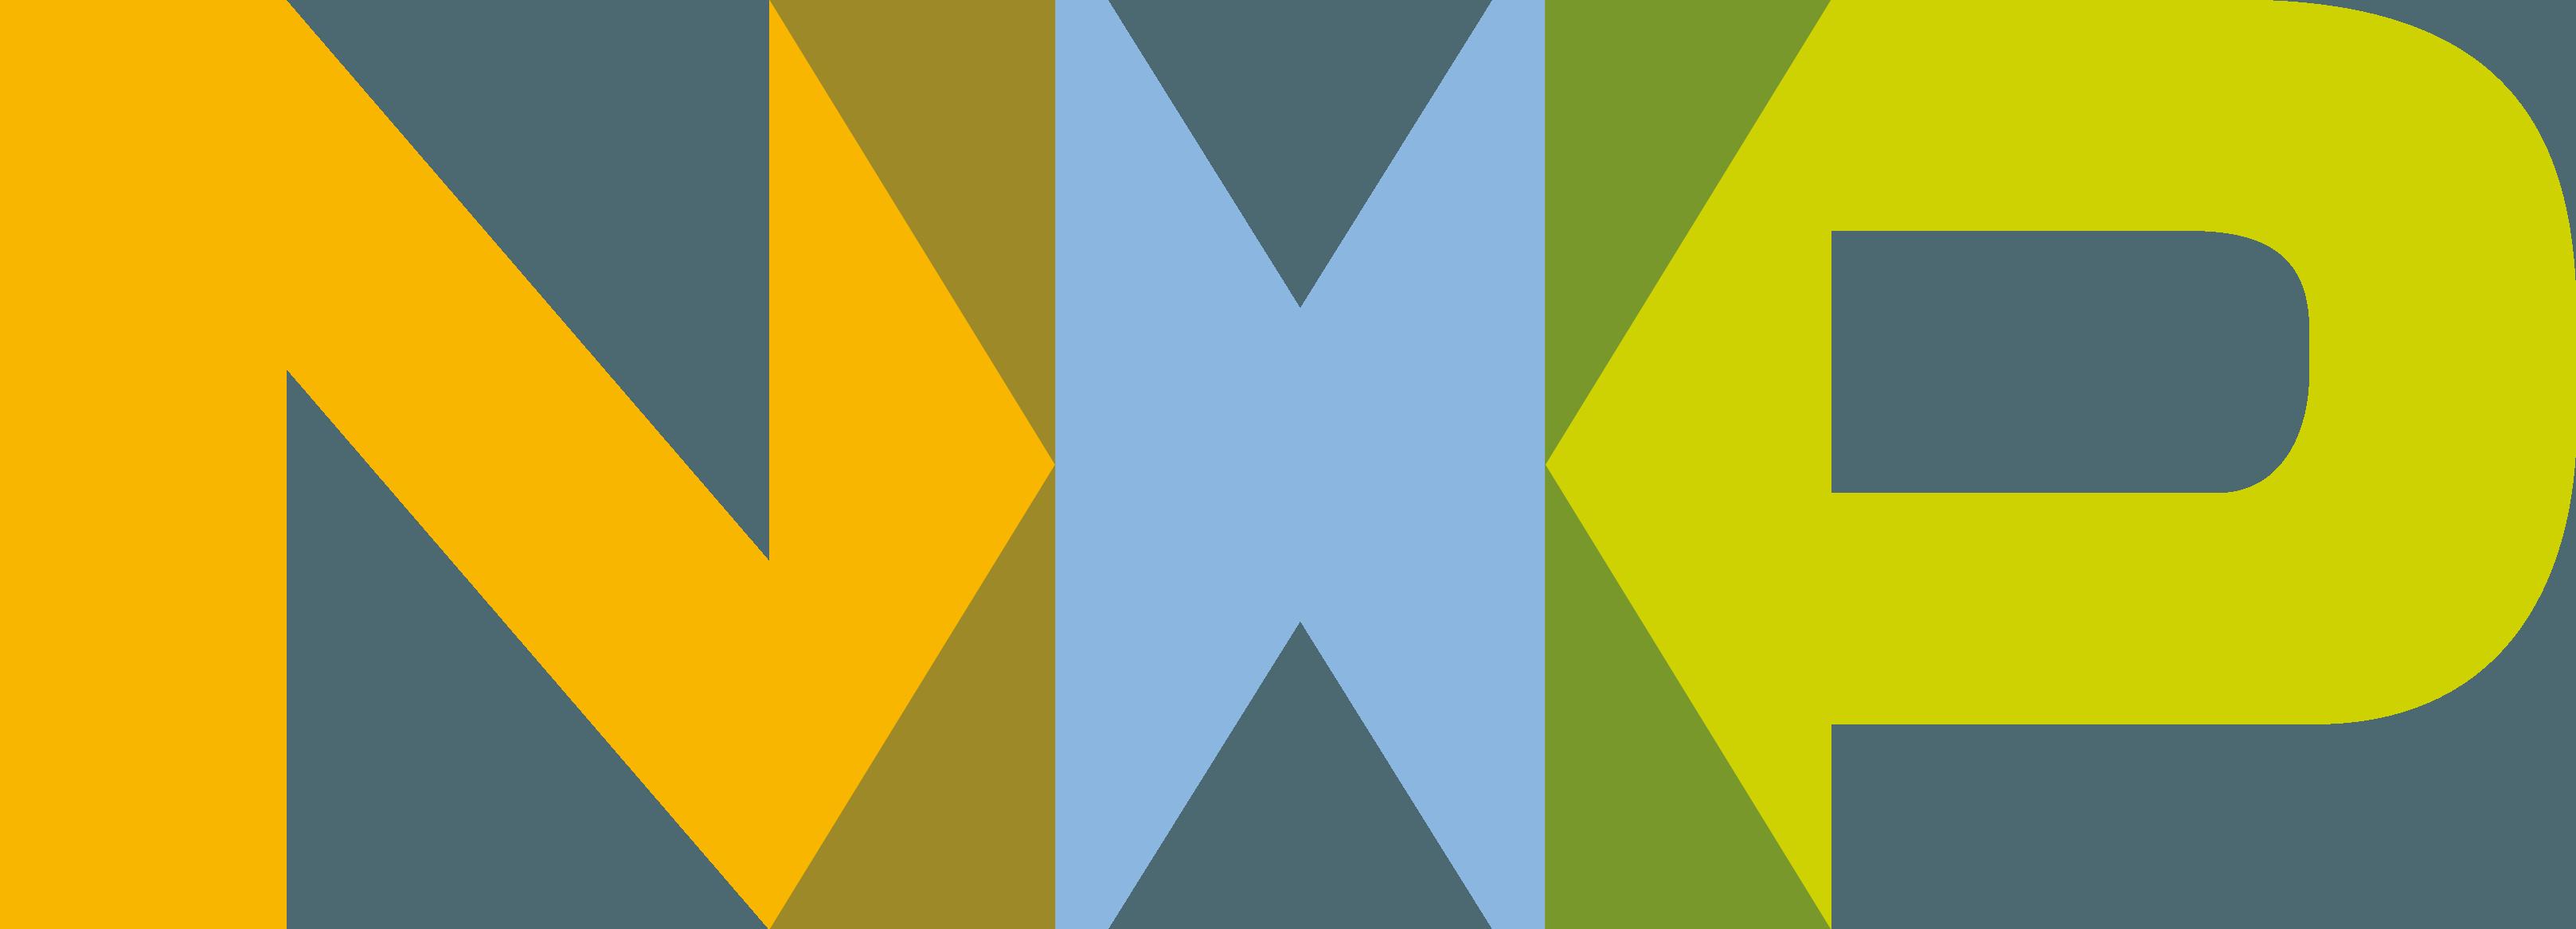 NXP Semiconductors Logo [nxp.com] png